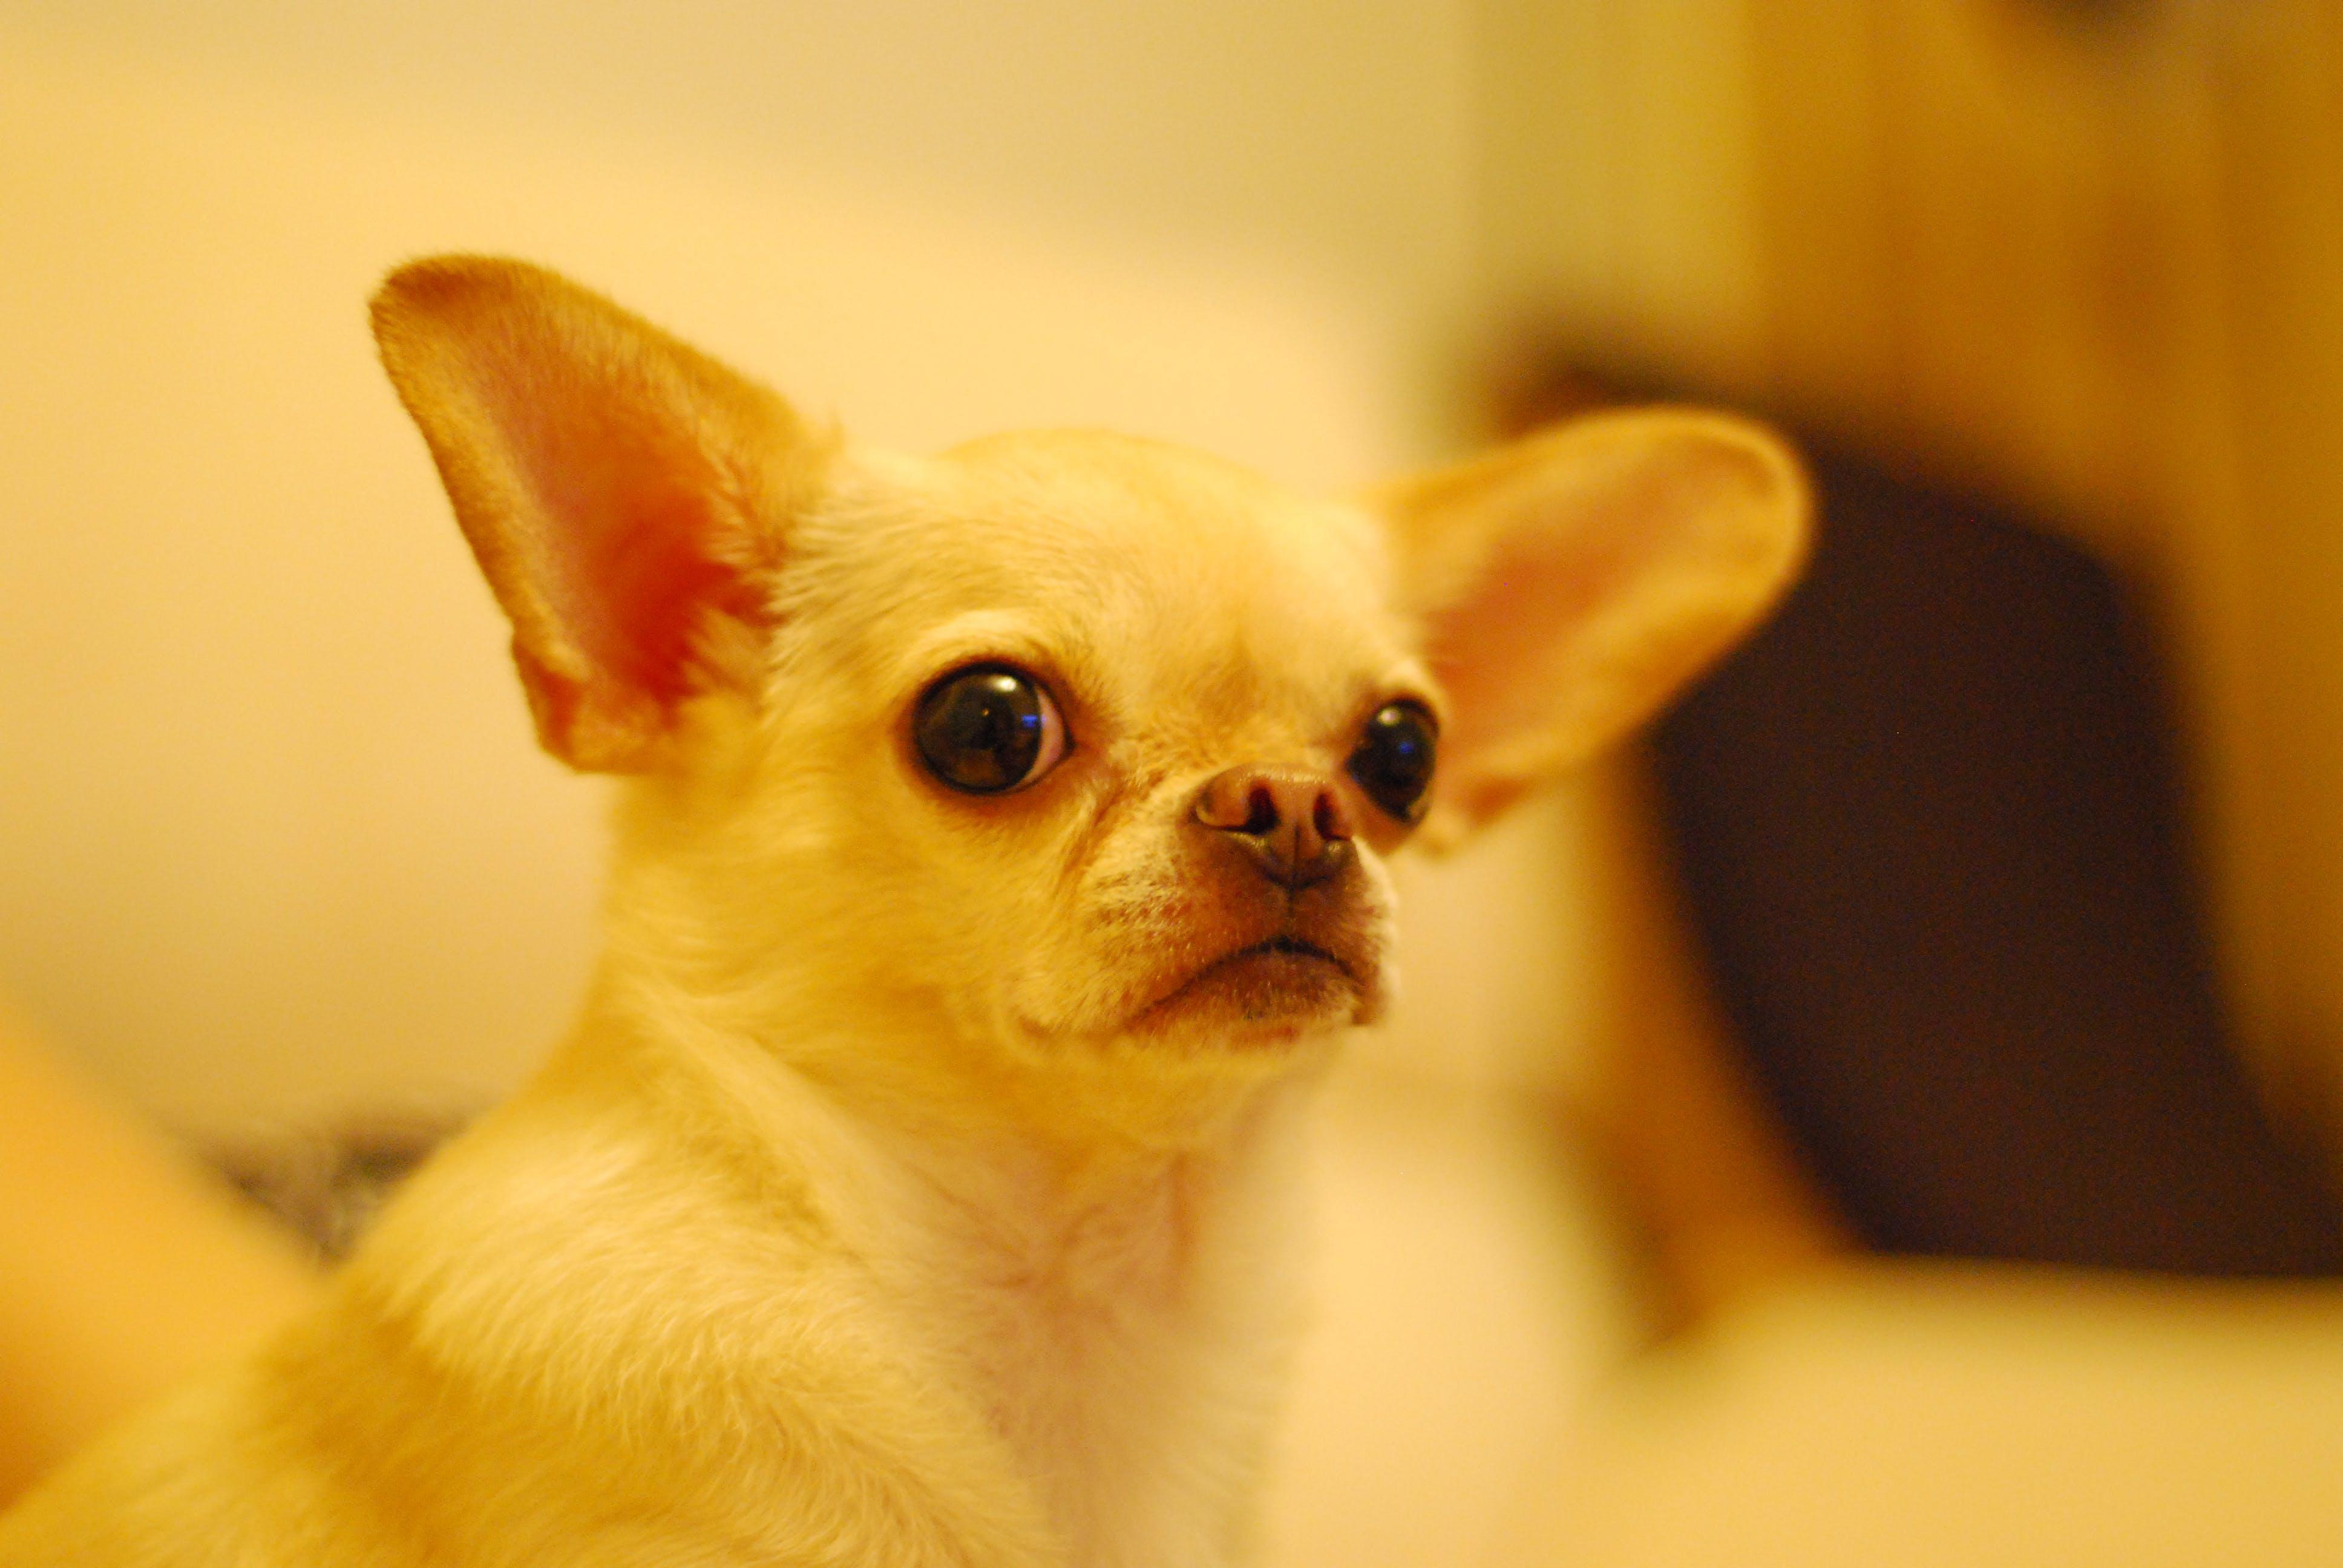 Free stock photo of dog, chihuahua